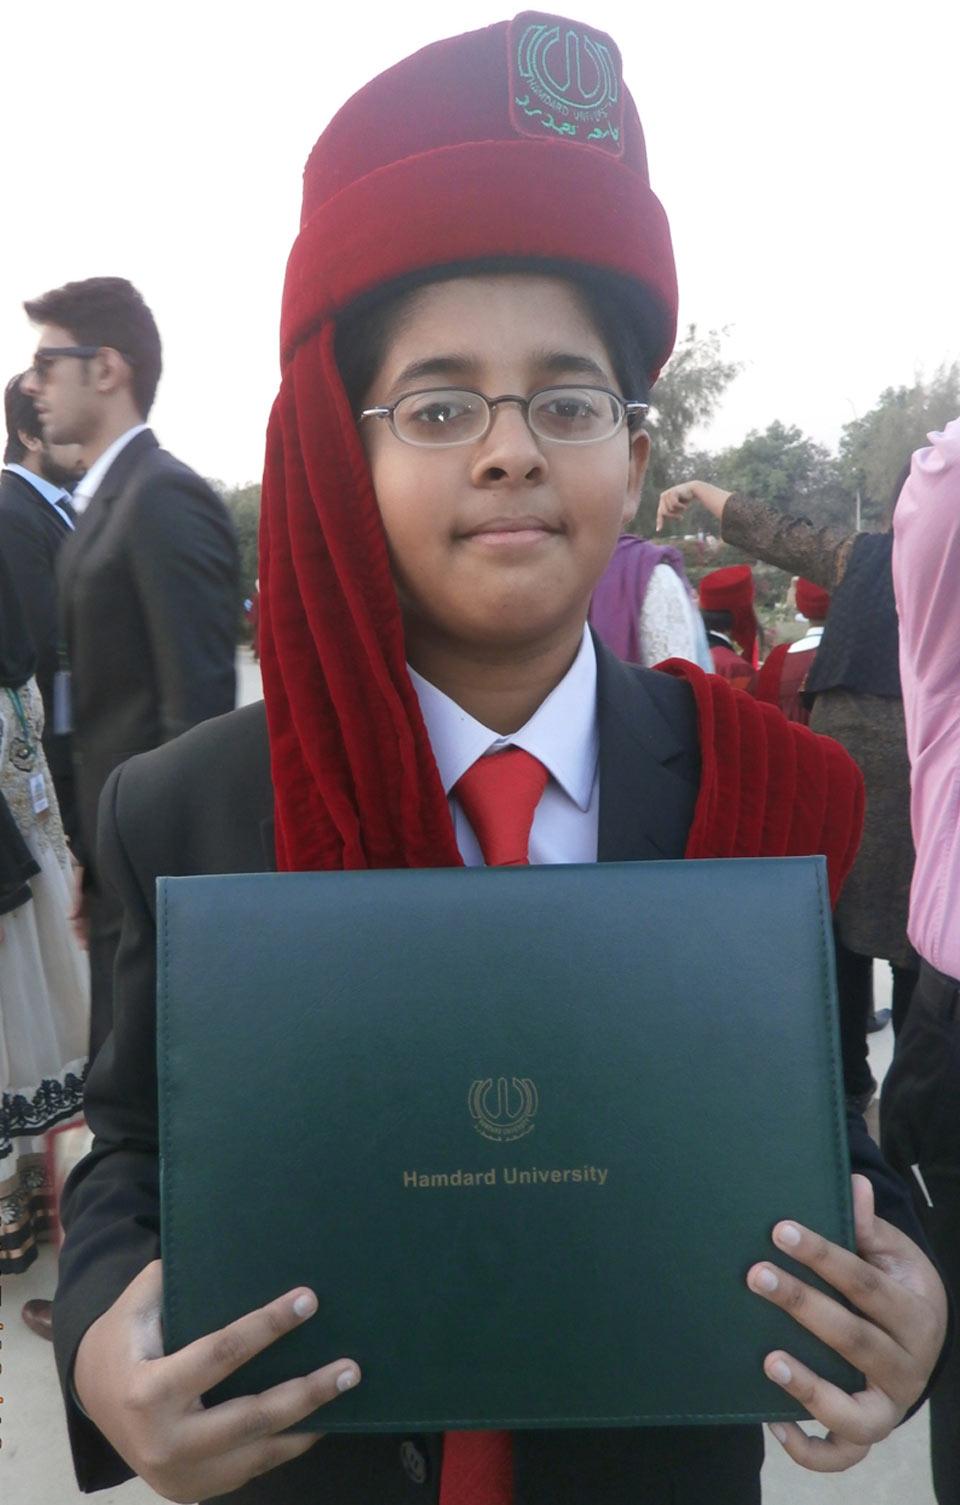 Habib Ur Rehman